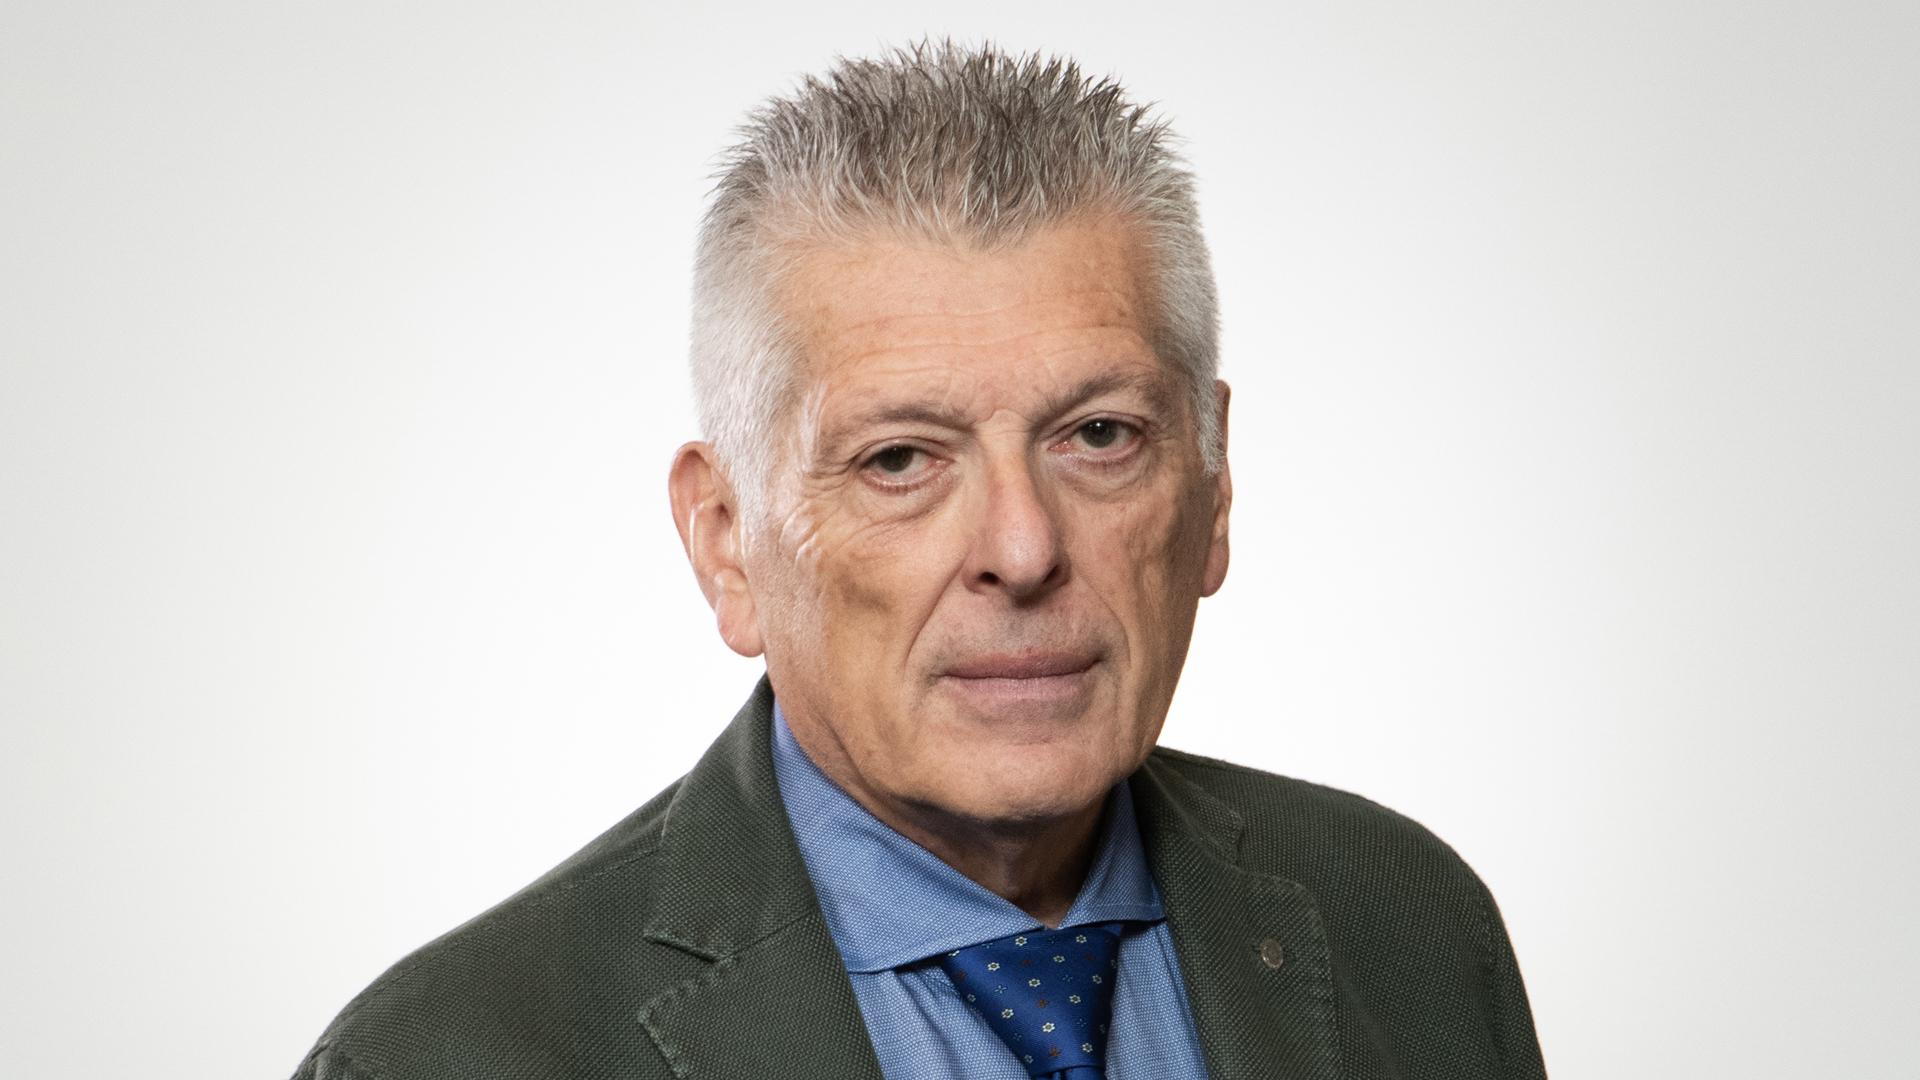 Vincenzi Massimo